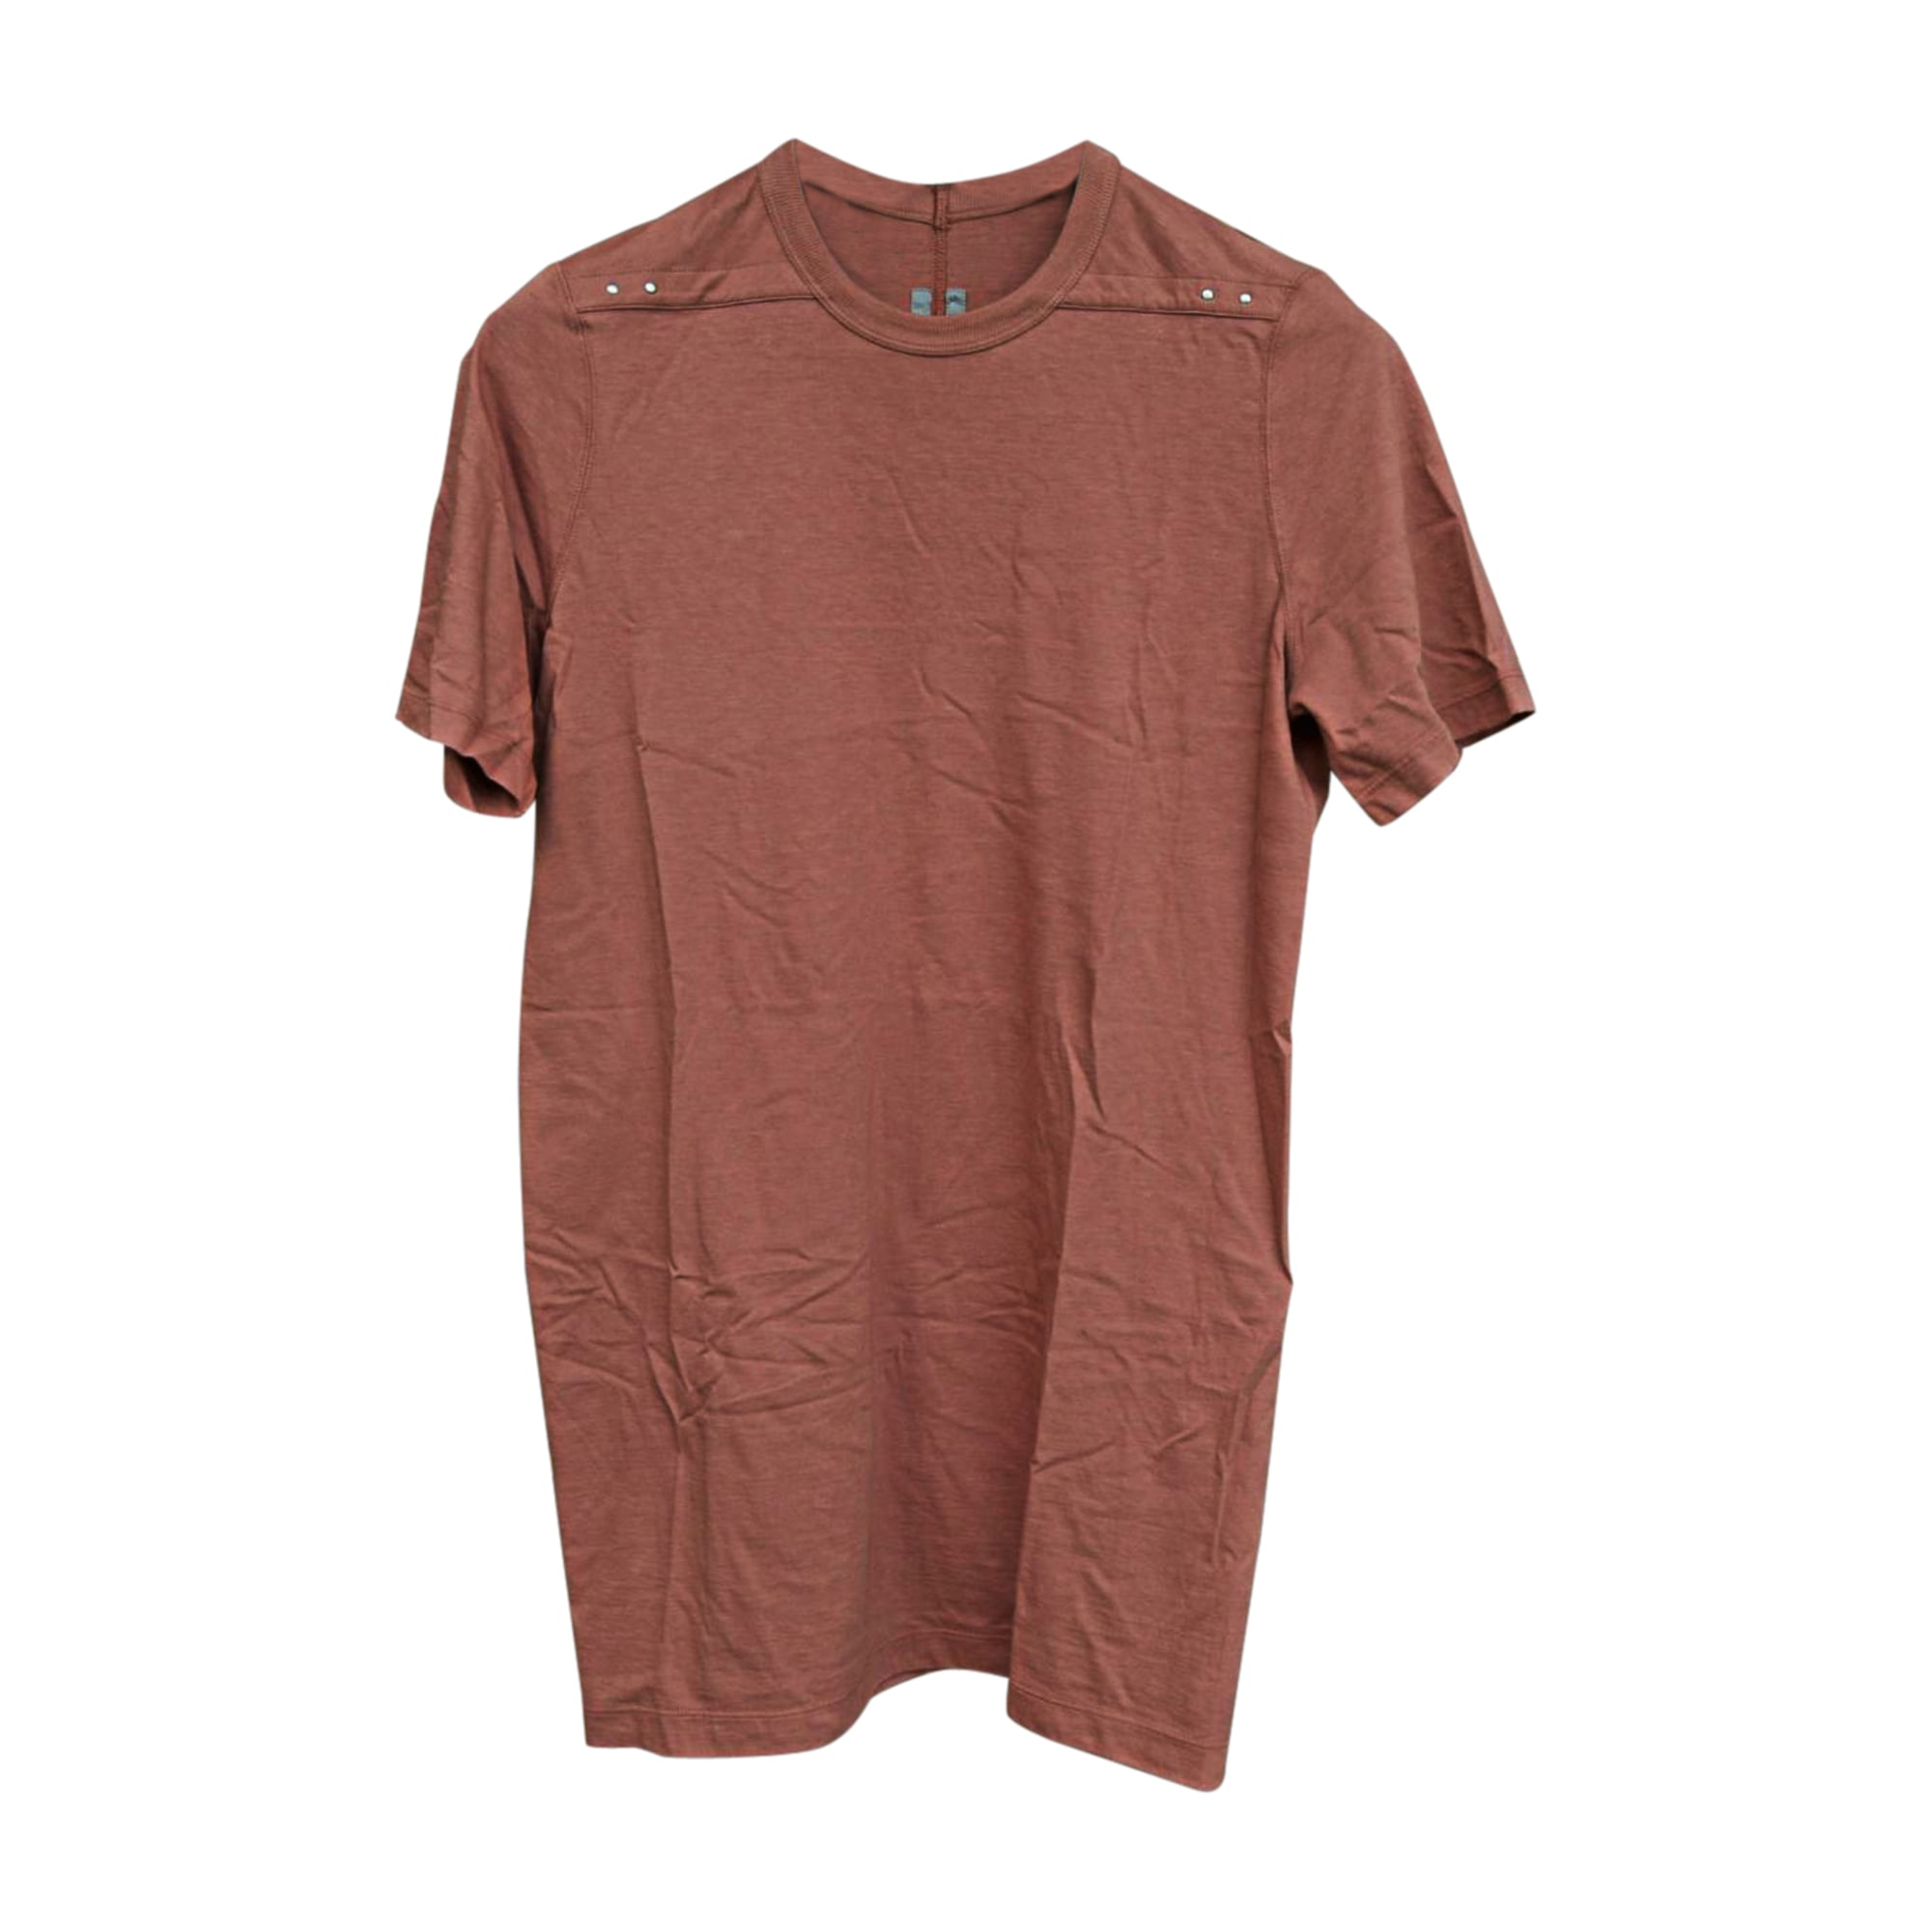 Tee-shirt RICK OWENS Rose, fuschia, vieux rose